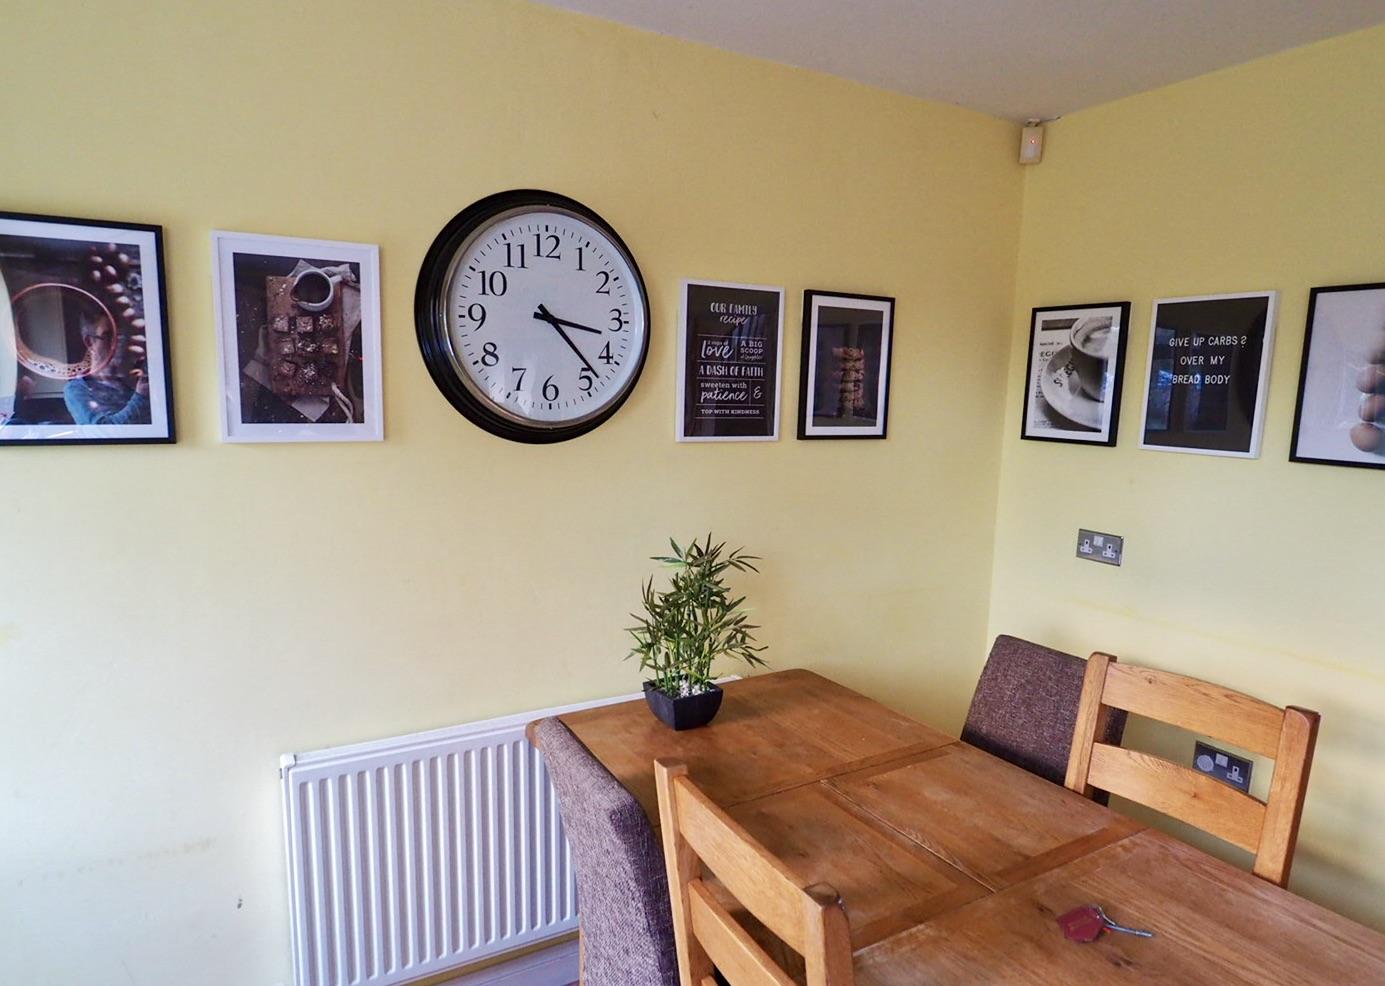 Kitchen prints from Desenio